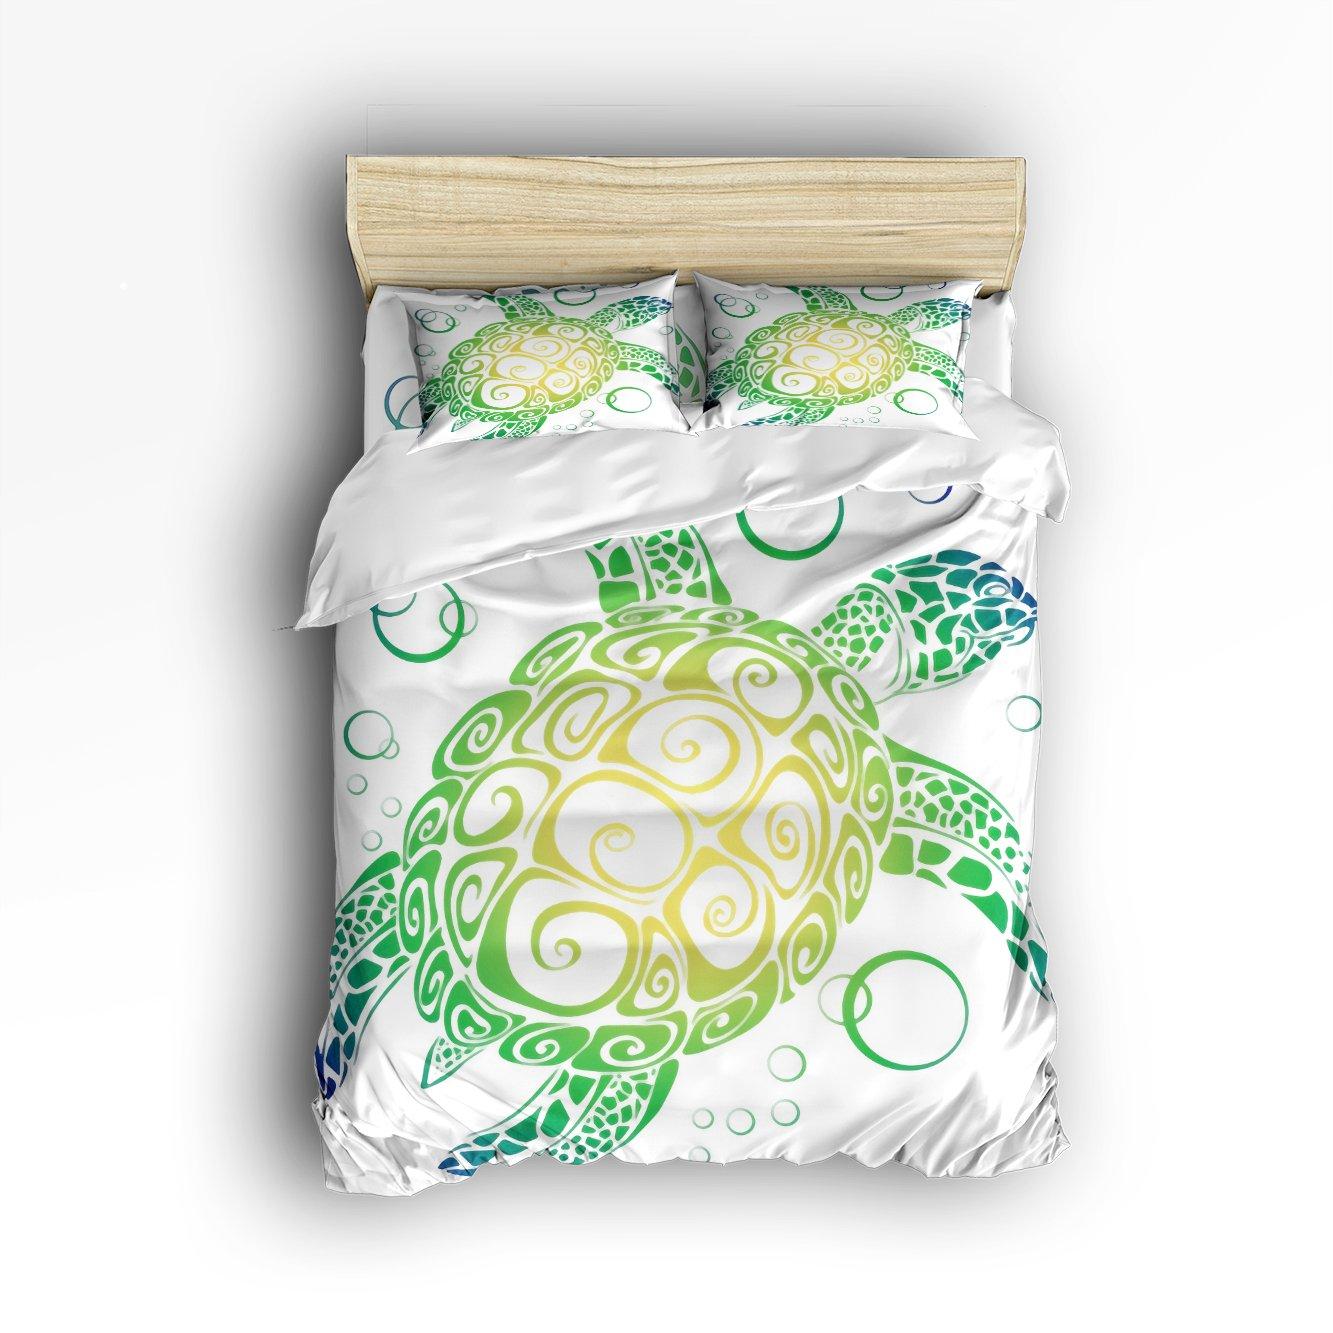 King Size Bedding Set- Sea Turtles Duvet Cover Set Bedspread for Childrens/Kids/Teens/Adults, 4 Piece 100 % Cotton by Vandarllin